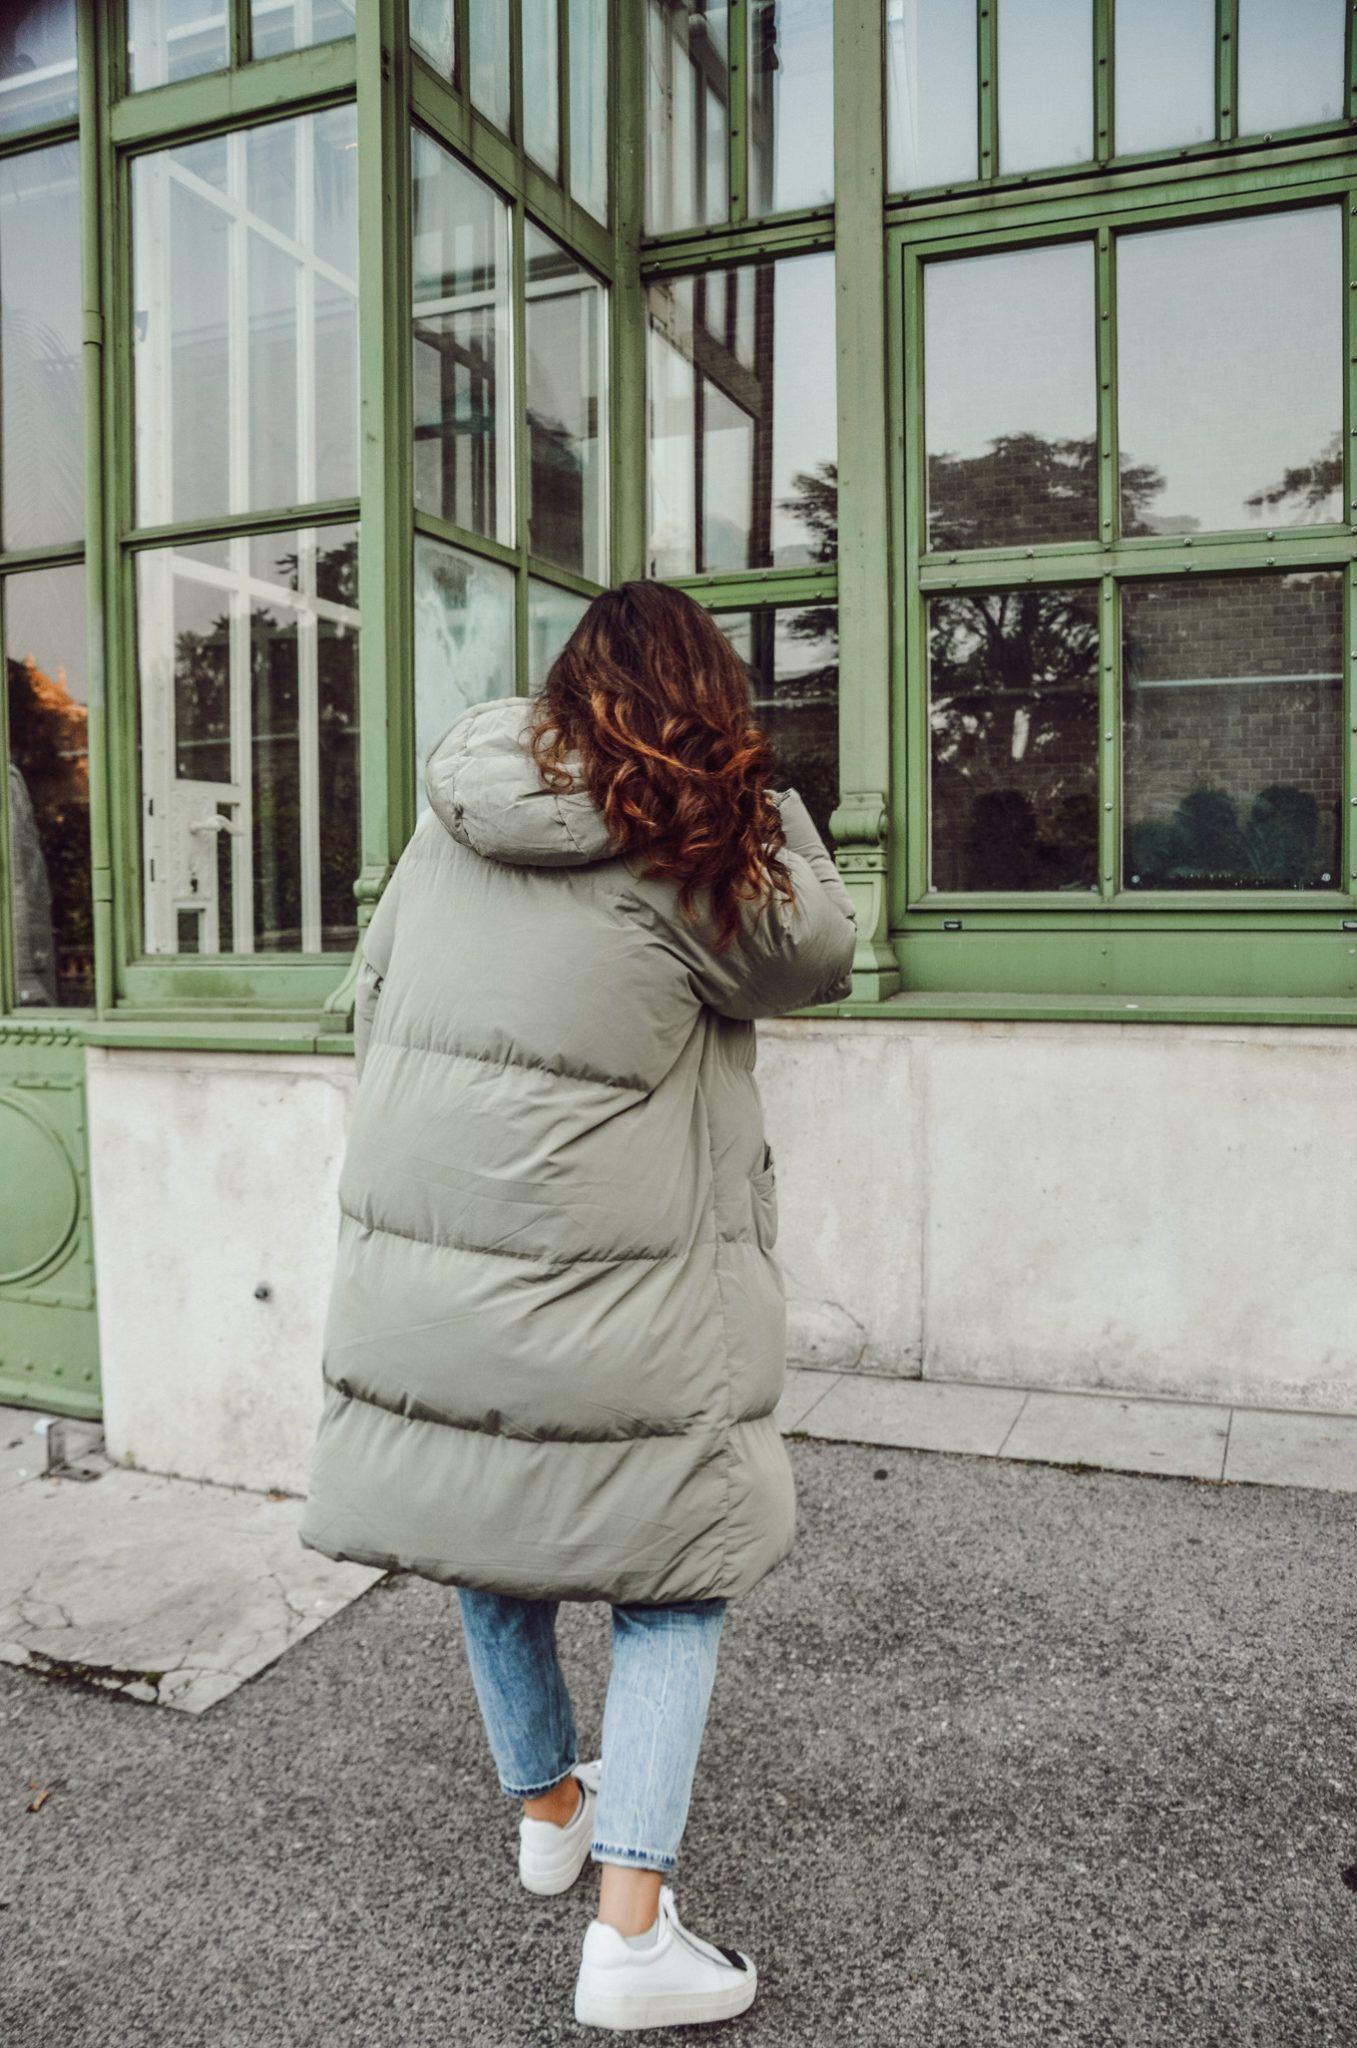 Welche ist die beste Winterjacke? (Mode, Kleidung, Jacke)